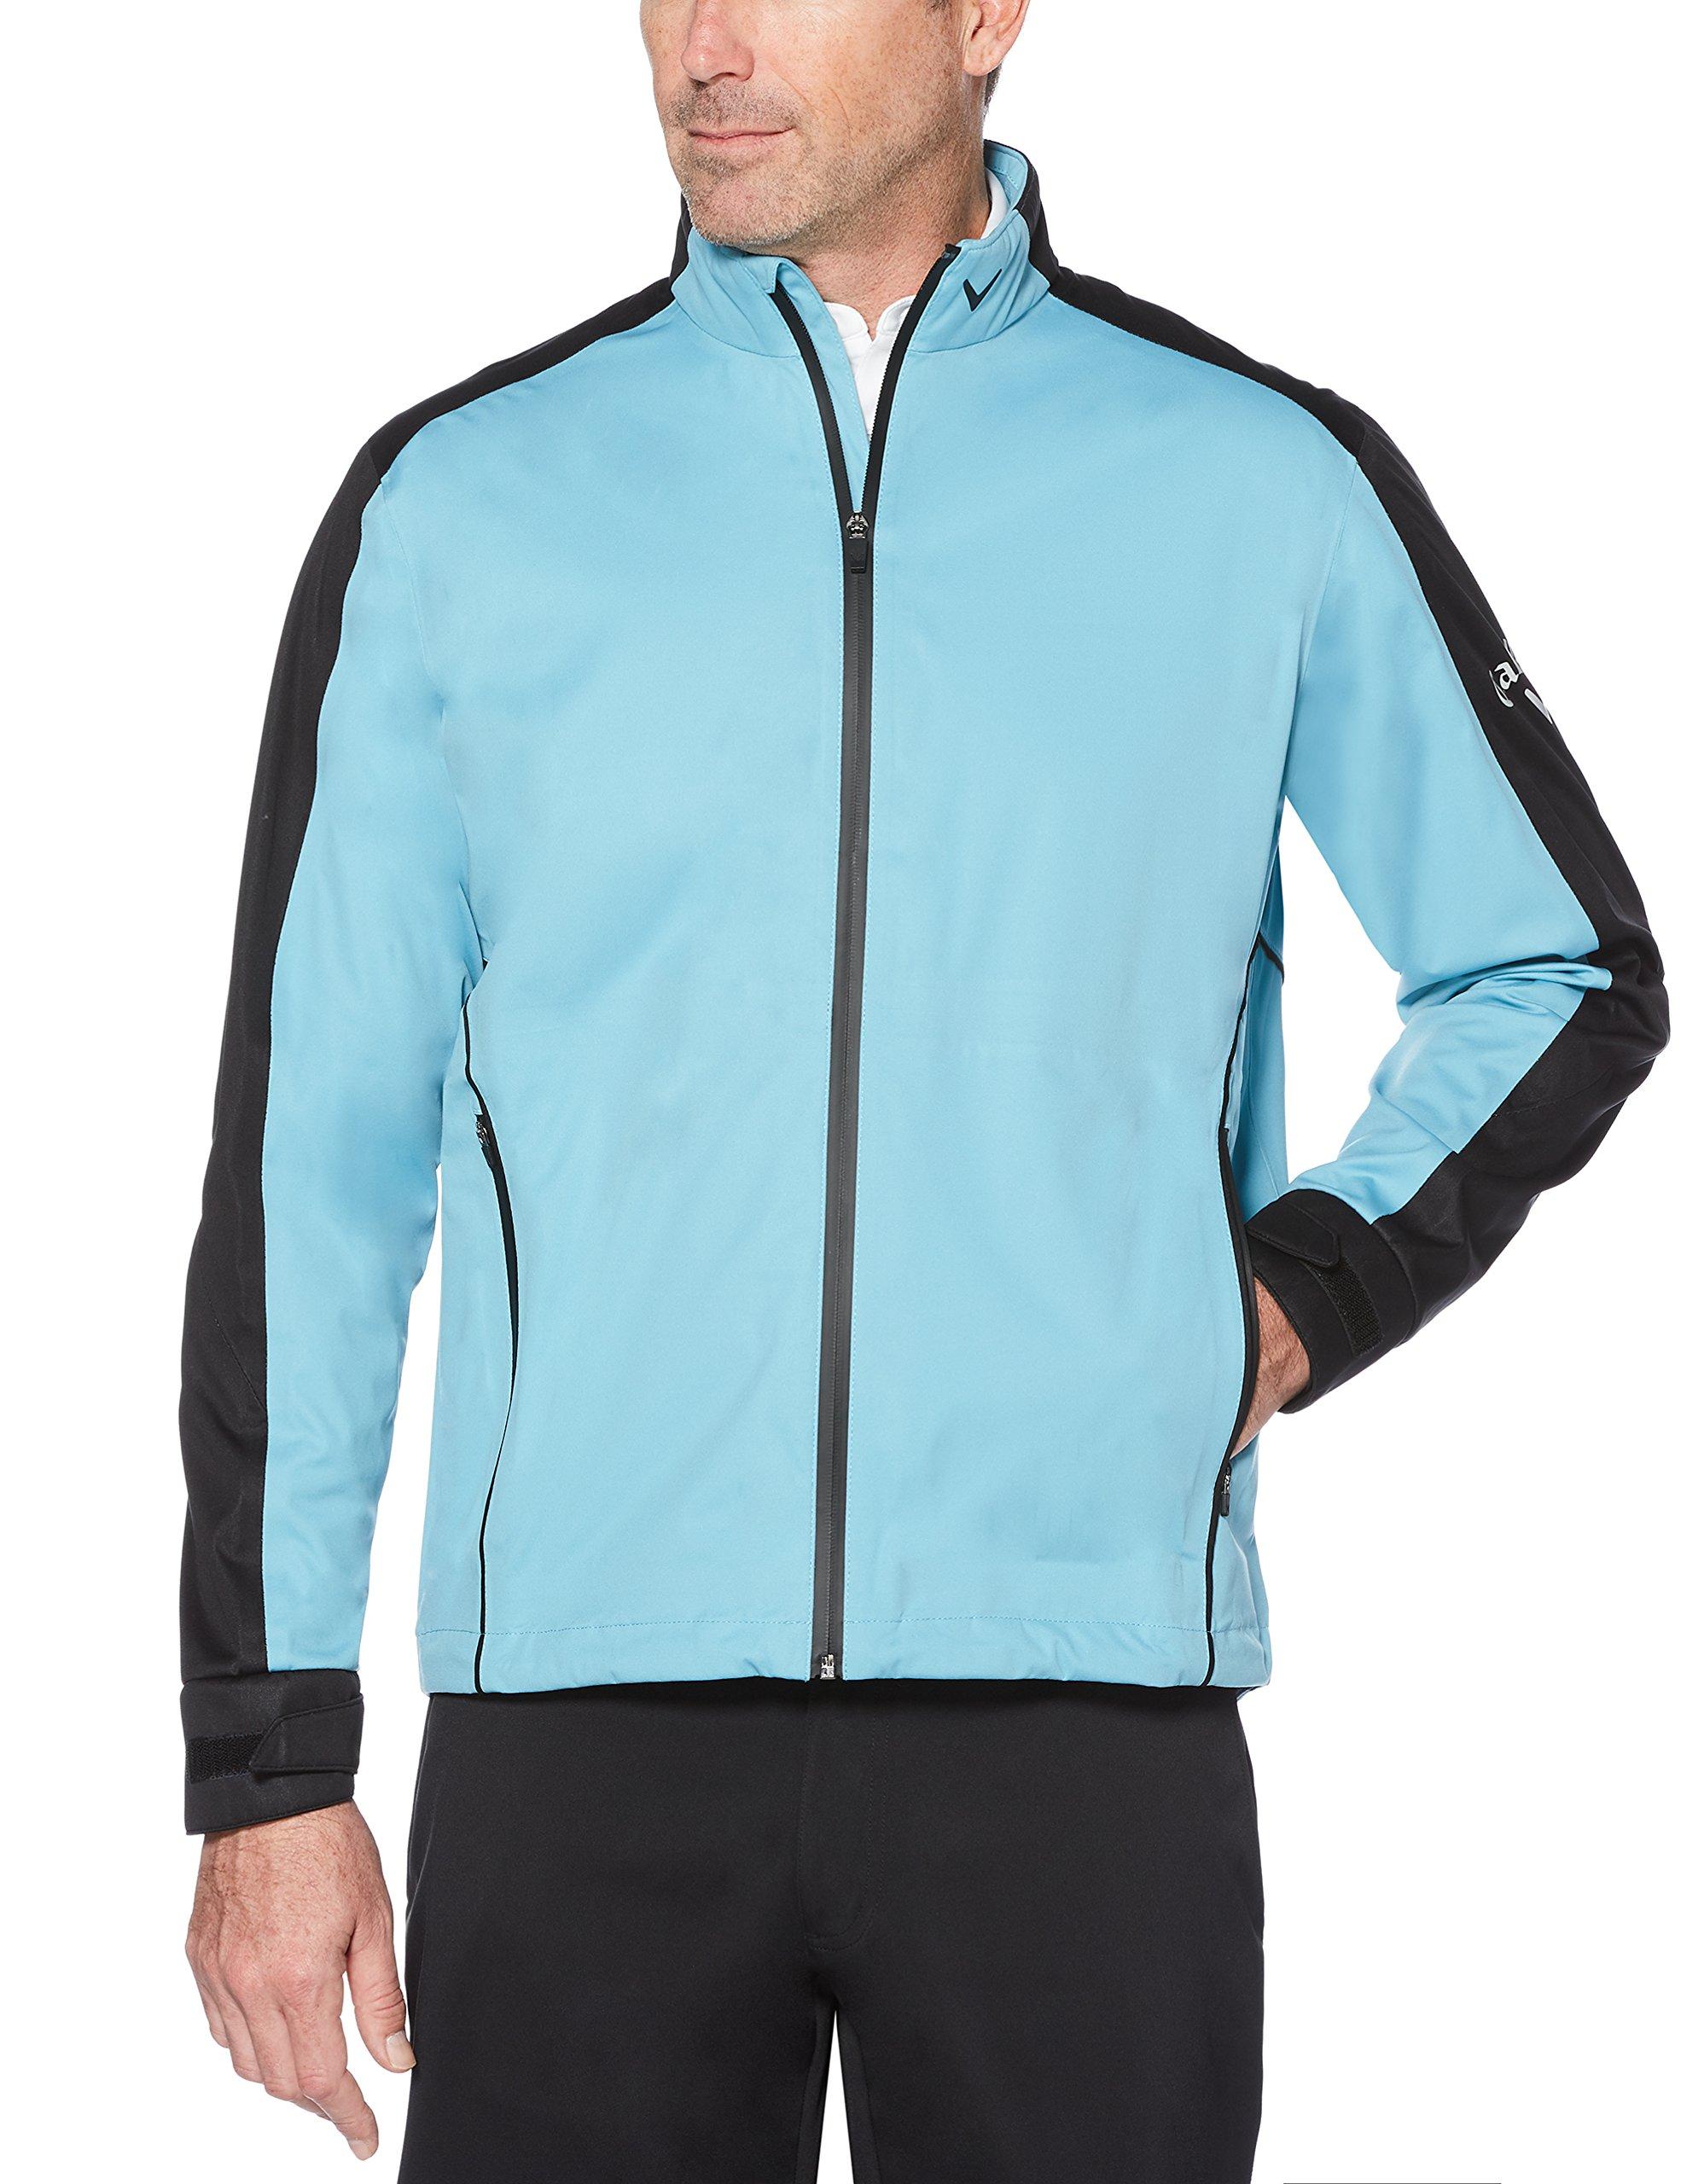 Callaway Men's Waterproof Full-zip Golf Jacket, Delphinium Blue, X-Large by Callaway